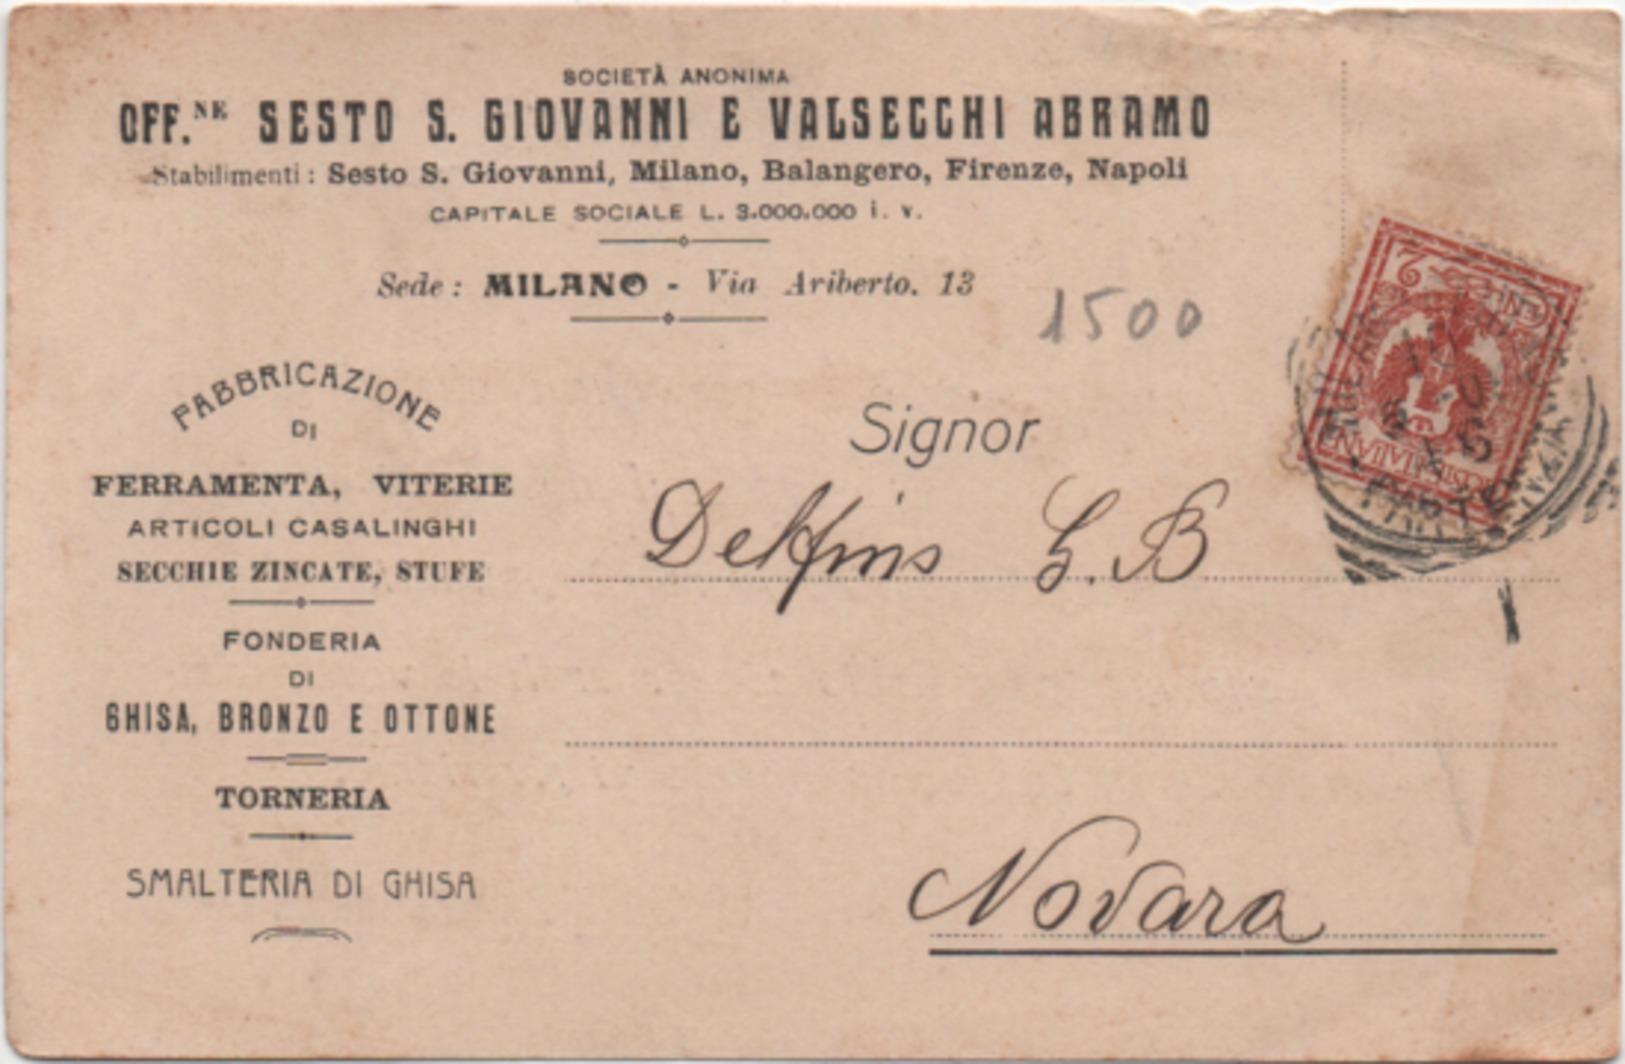 Milano: Officine Sesto San Giovanni E Valsecchi Abramo. Viaggiata 1916 Milano Firenze Napoli Balangero (Torino) - Milano (Milan)